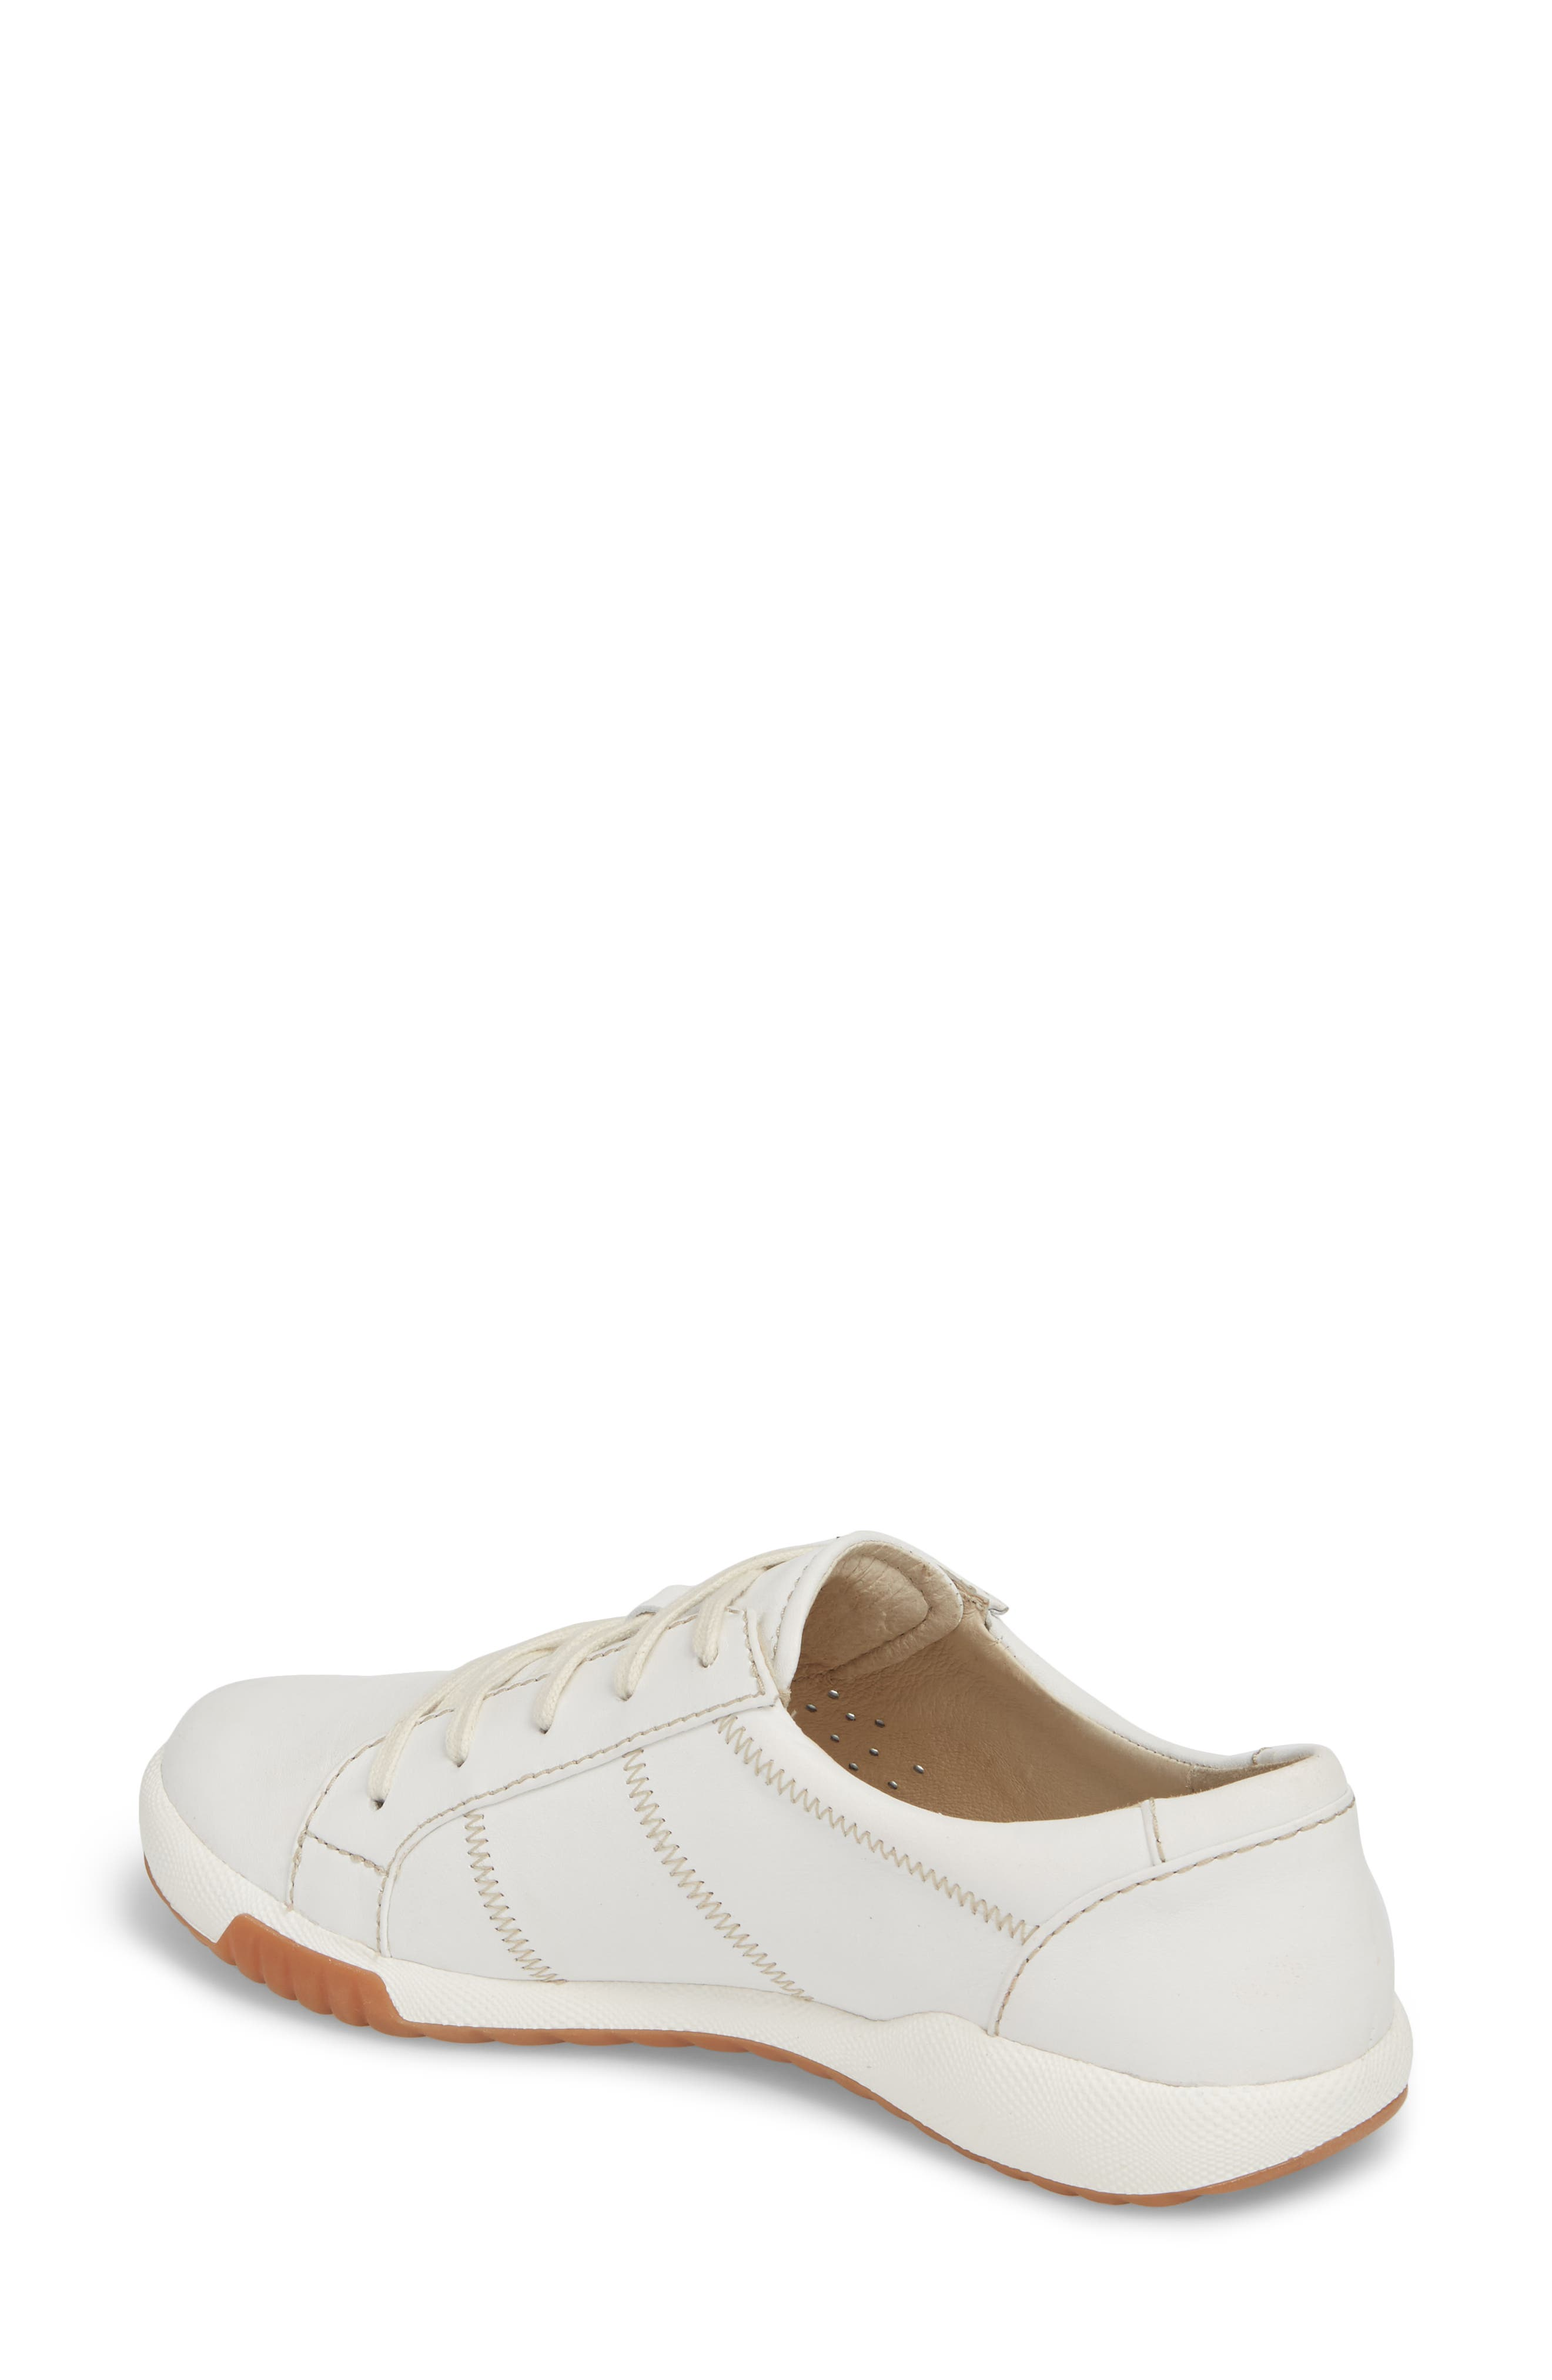 Cordoba 01 Sneaker,                             Alternate thumbnail 2, color,                             WHITE LEATHER